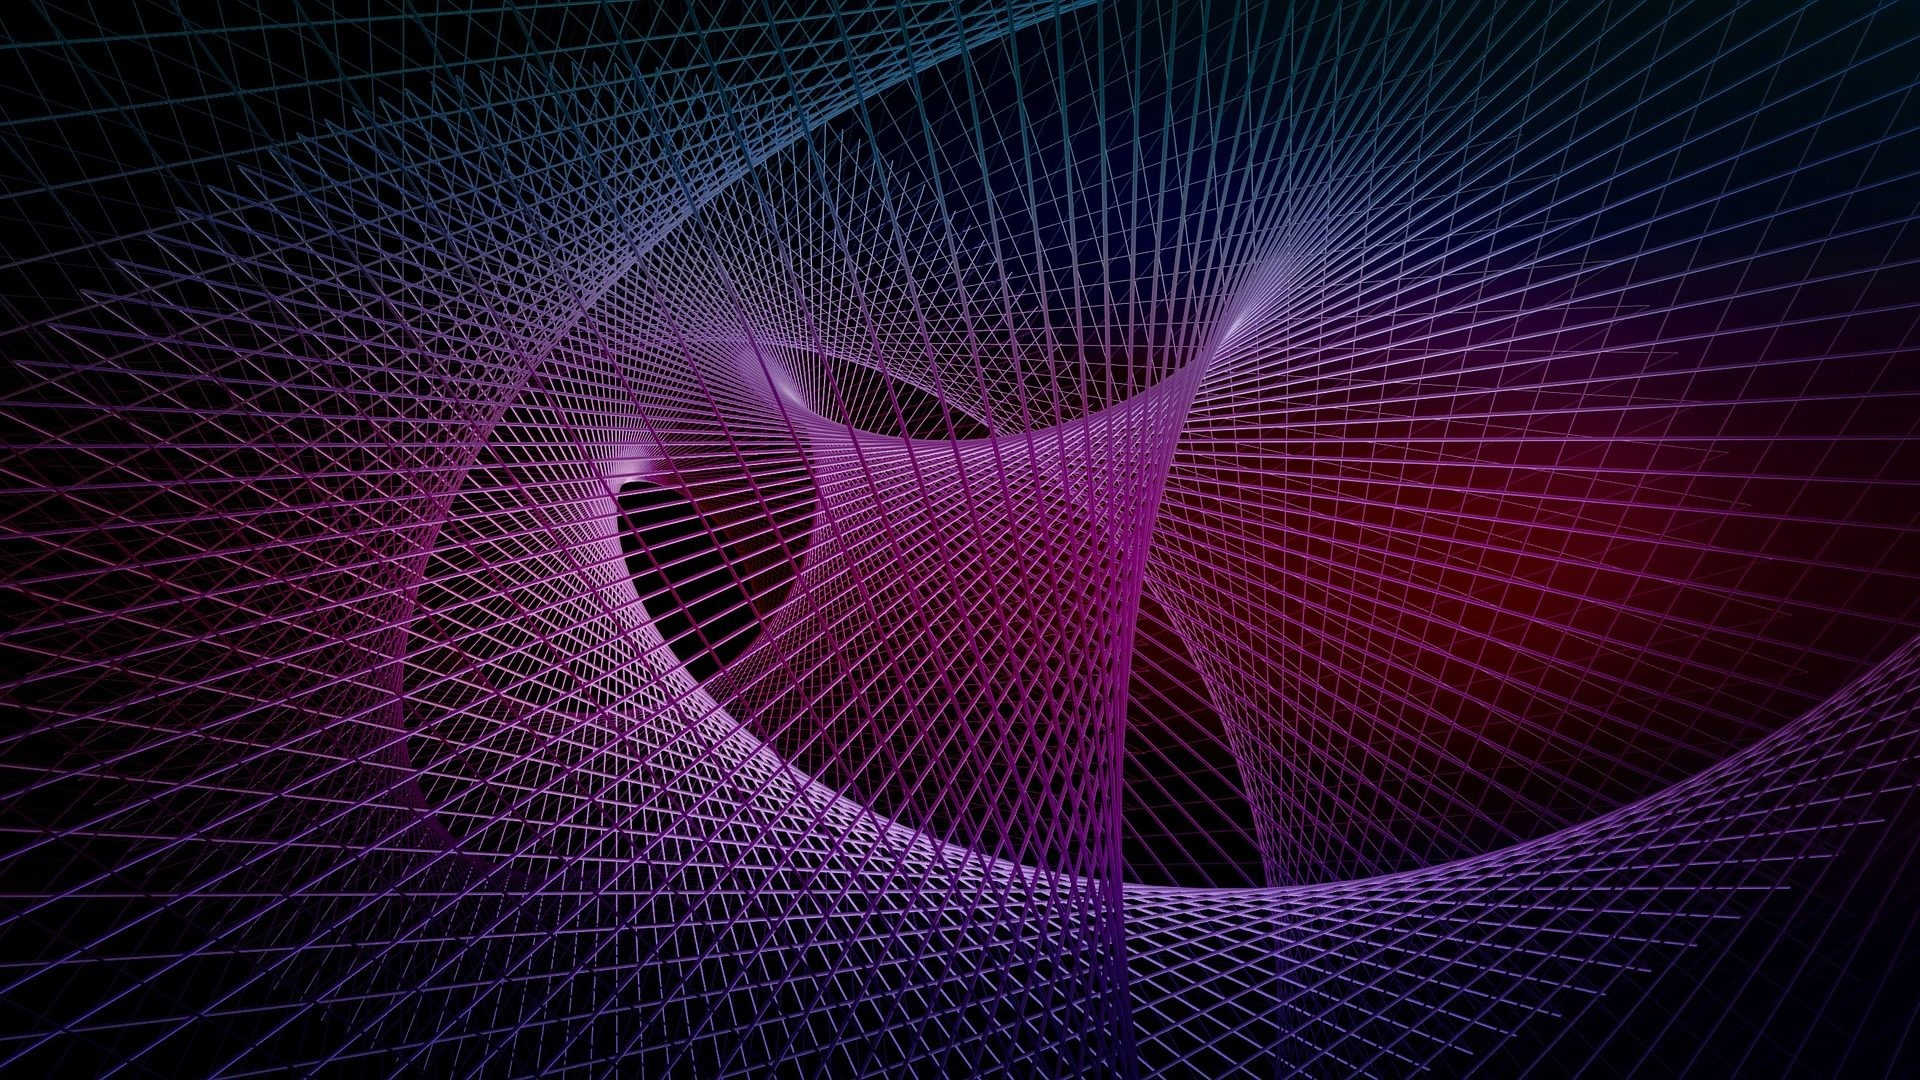 Sfondi Geometrici 60 Immagini